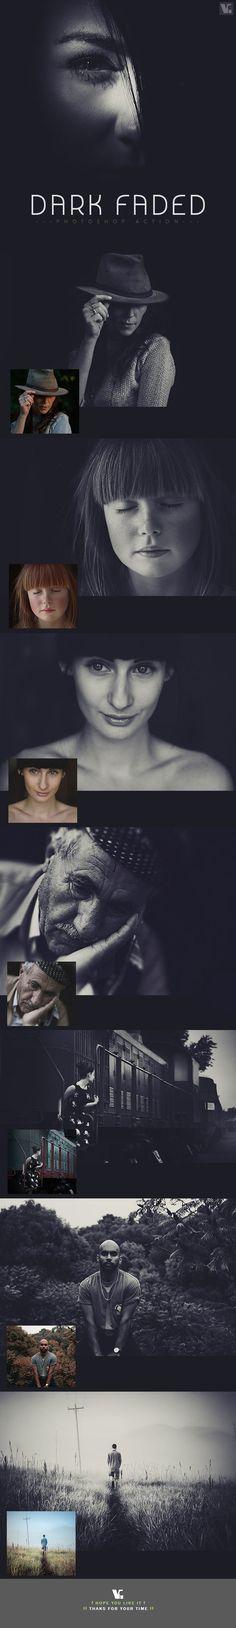 Dark Faded Photoshop Action — Photoshop ATN #dark action #dark film • Available here → https://graphicriver.net/item/dark-faded-photoshop-action/19425447?ref=pxcr